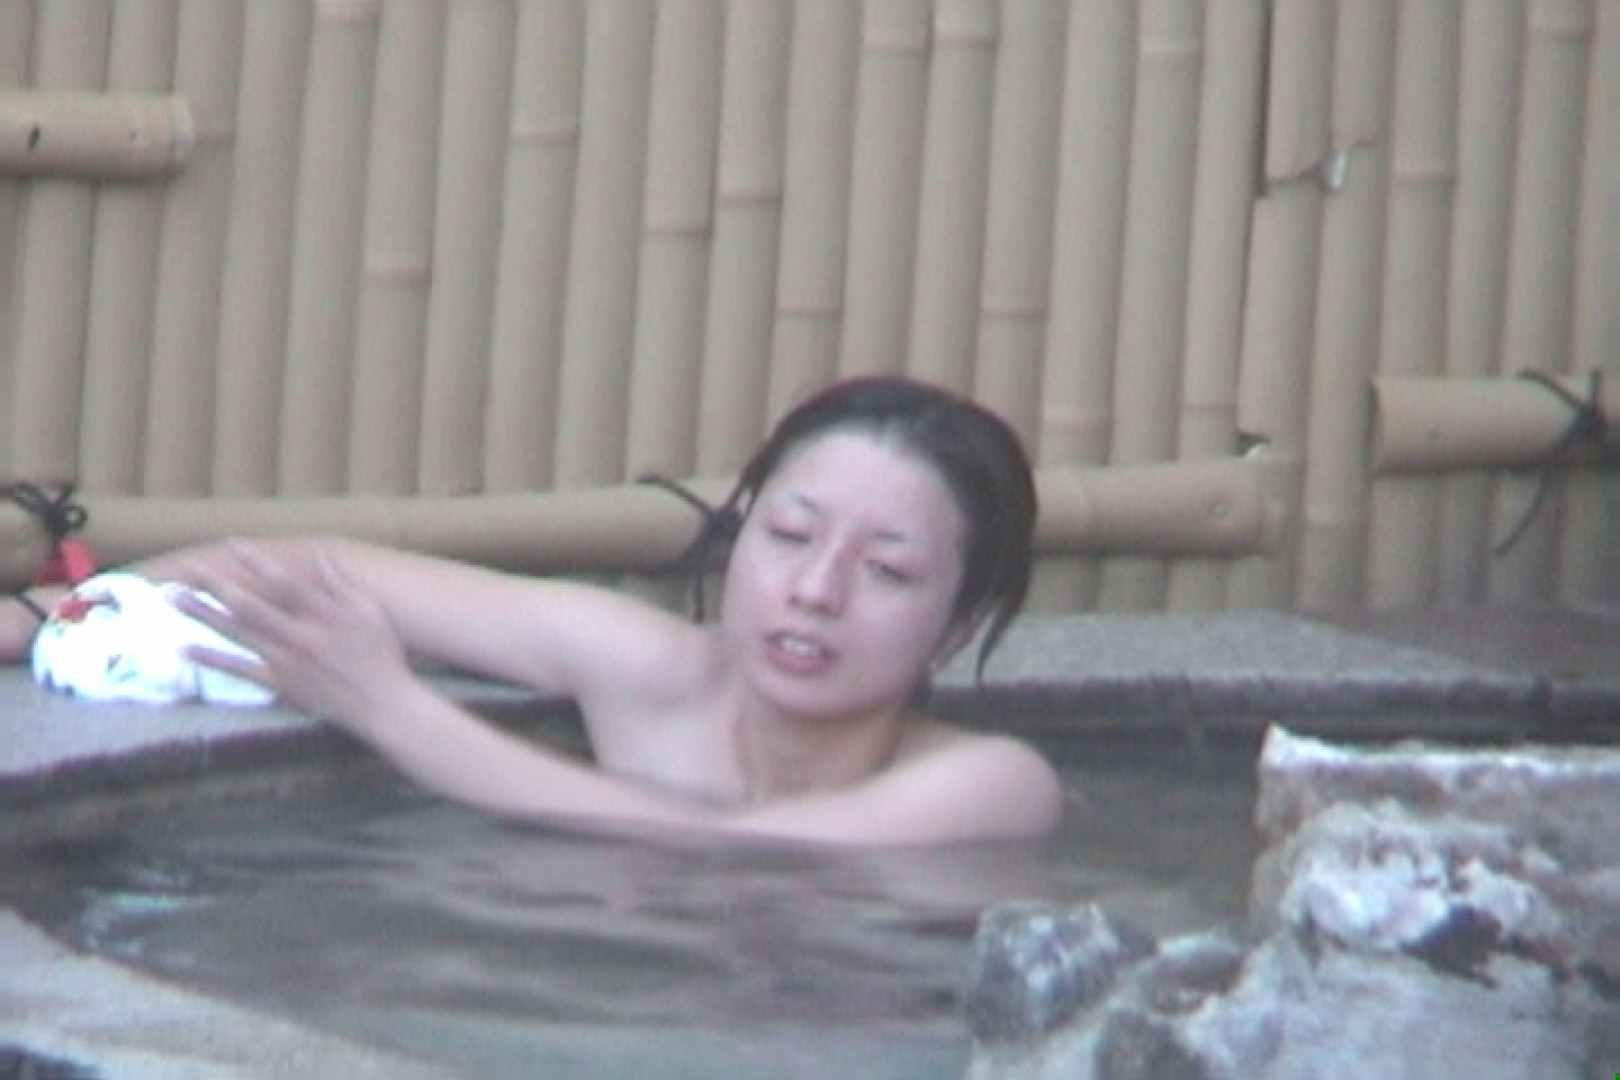 Aquaな露天風呂Vol.608 HなOL | 盗撮  89pic 4